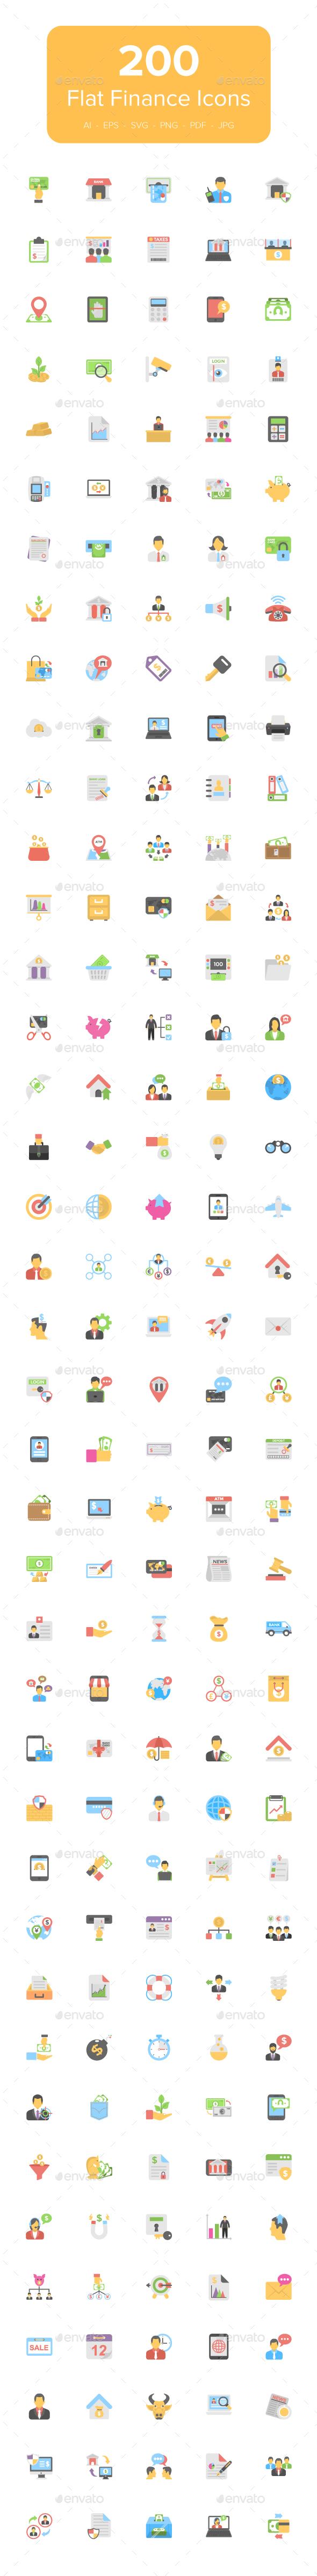 200 Flat Finance Icons - Icons